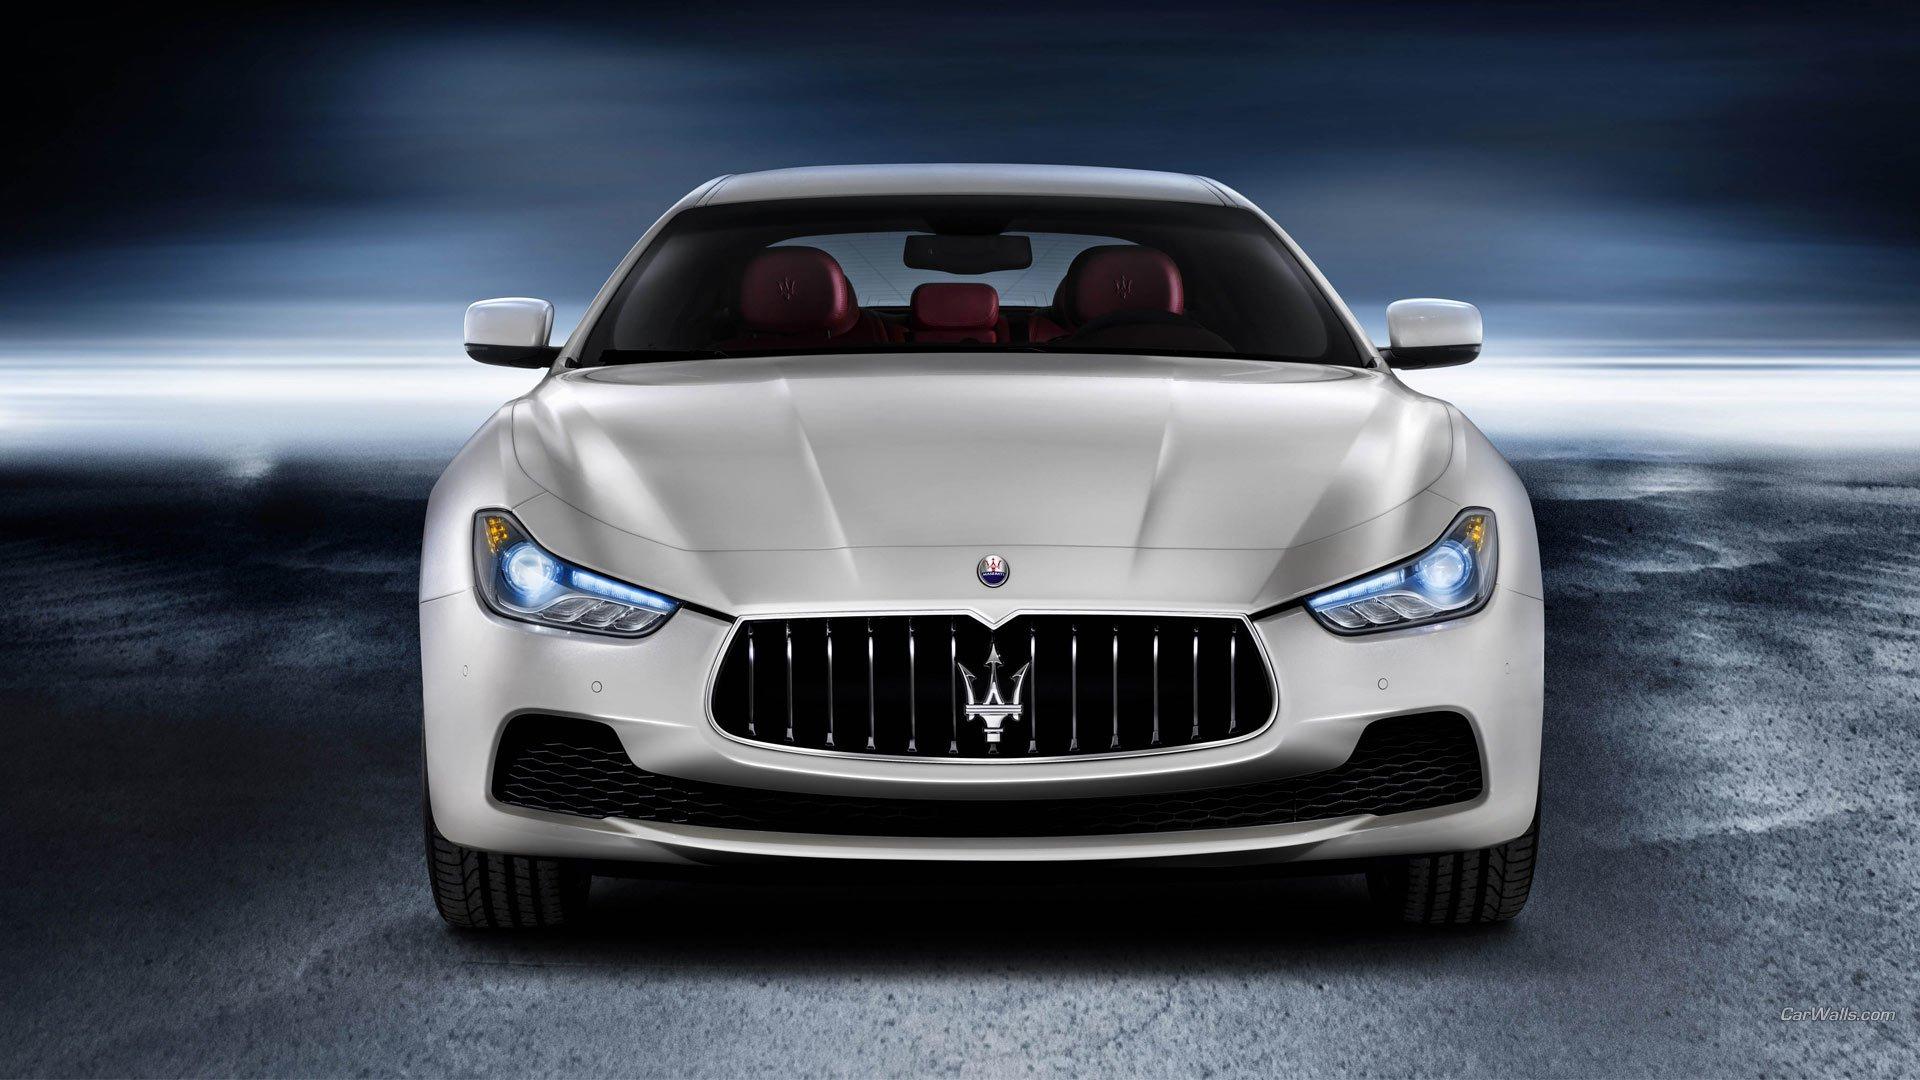 Vehicles - Maserati Ghibli  Wallpaper